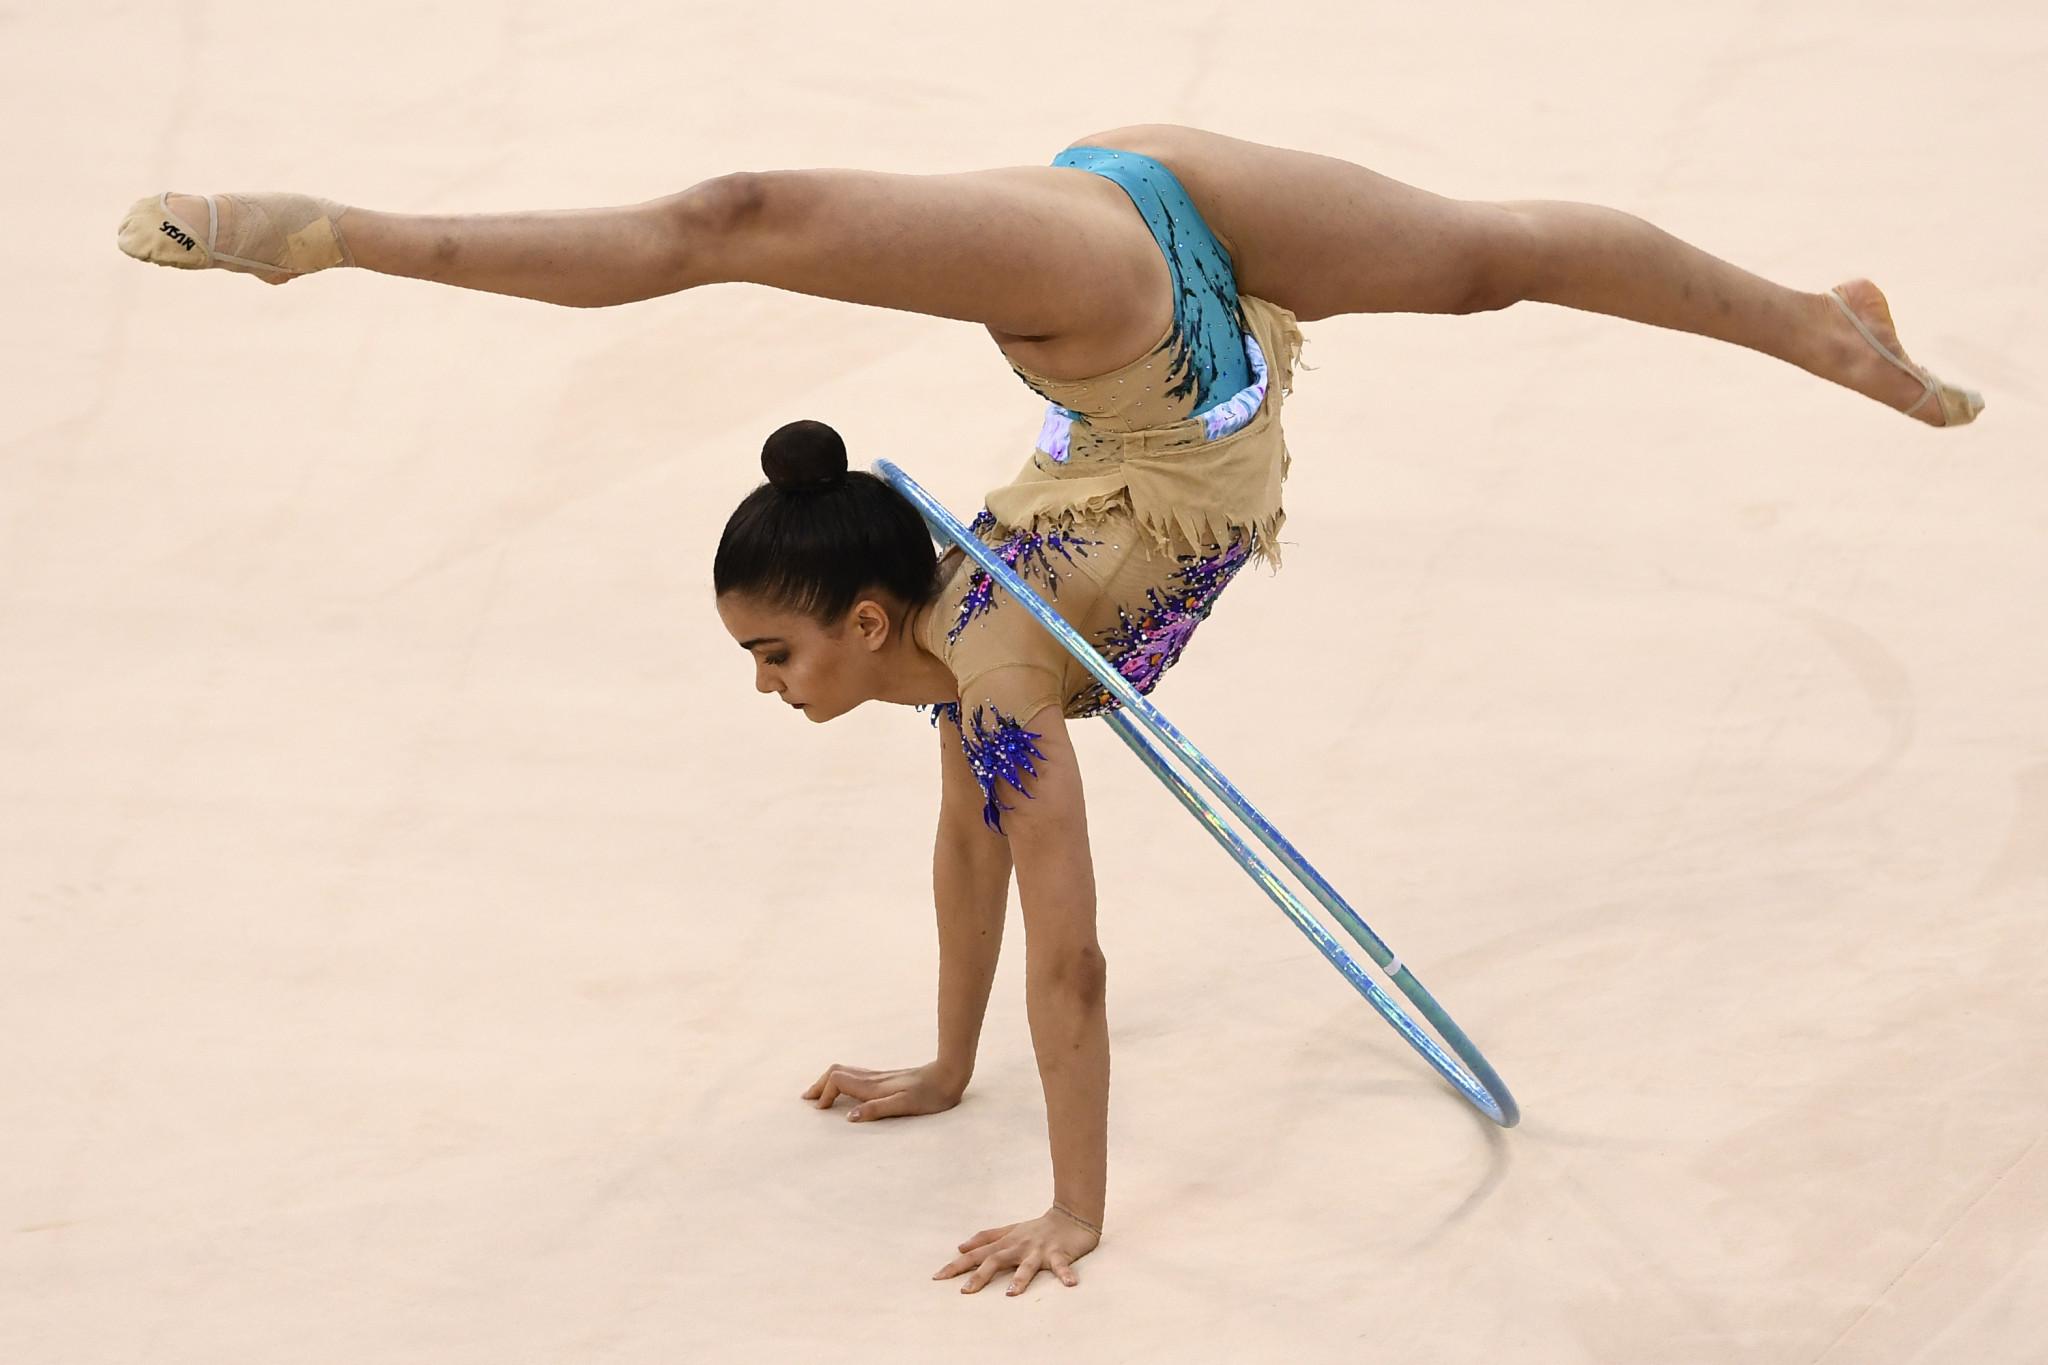 Baku to stage two European Gymnastics Championships in 2019